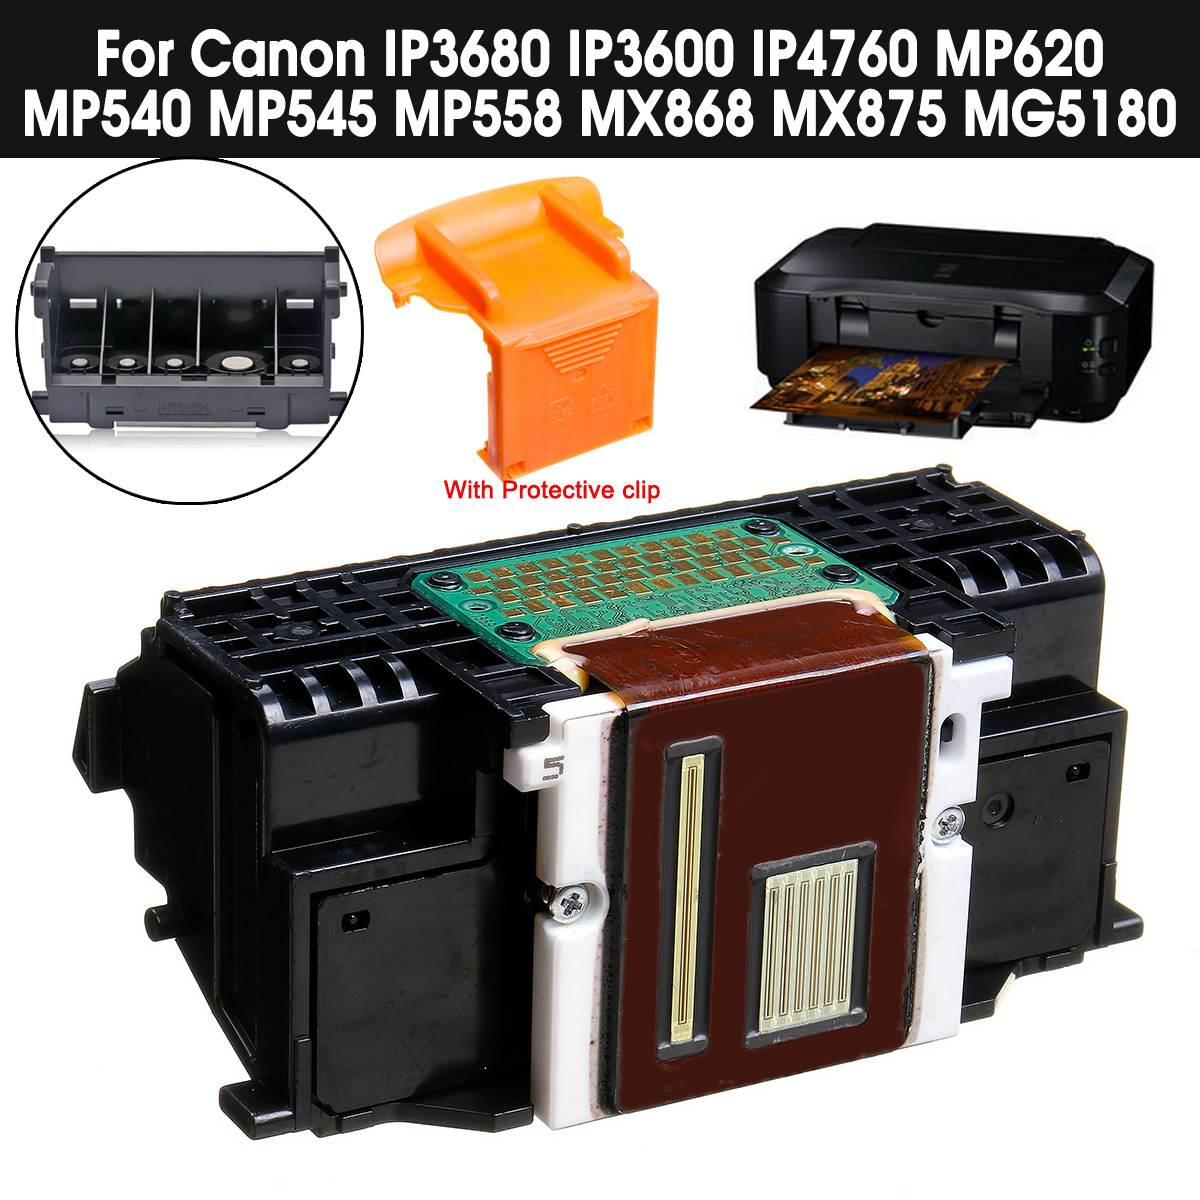 LEORY QY6-0073 מדפסת ראש ההדפסה ראש מדפסת חלקי אביזרי עבור Canon iP3600 iP3600 MP540 MP558 MX875 MX868 MG518